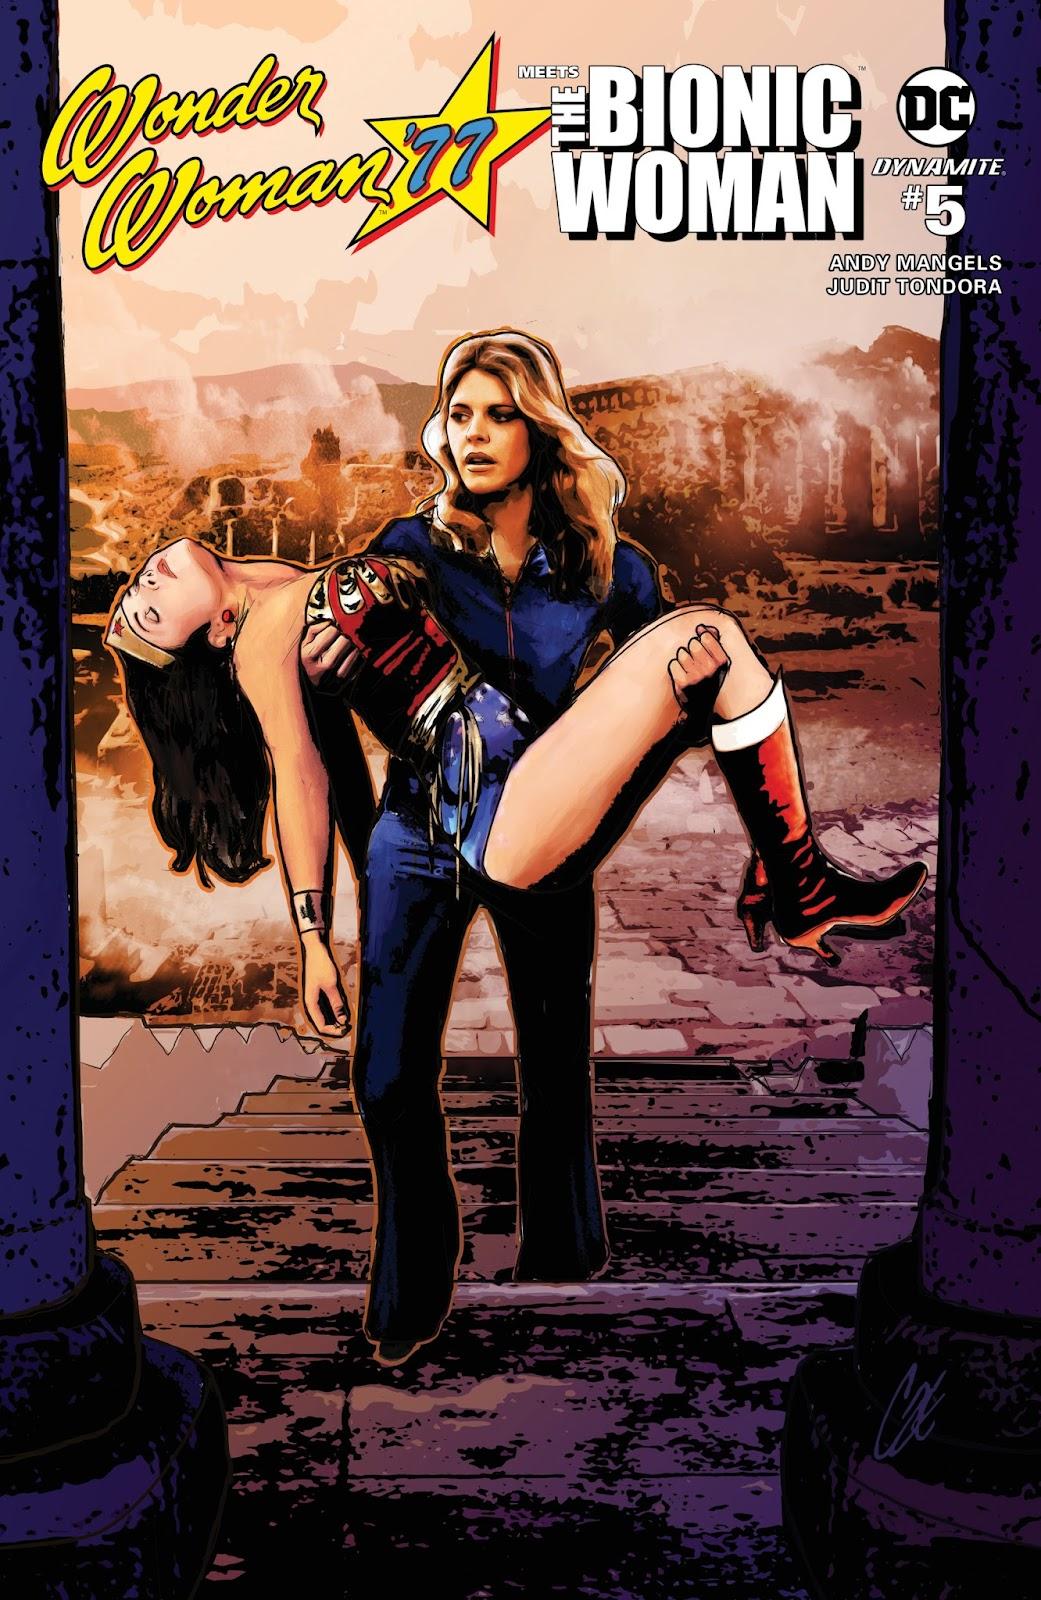 Wonder Woman 77 Meets The Bionic Woman 5 Page 1